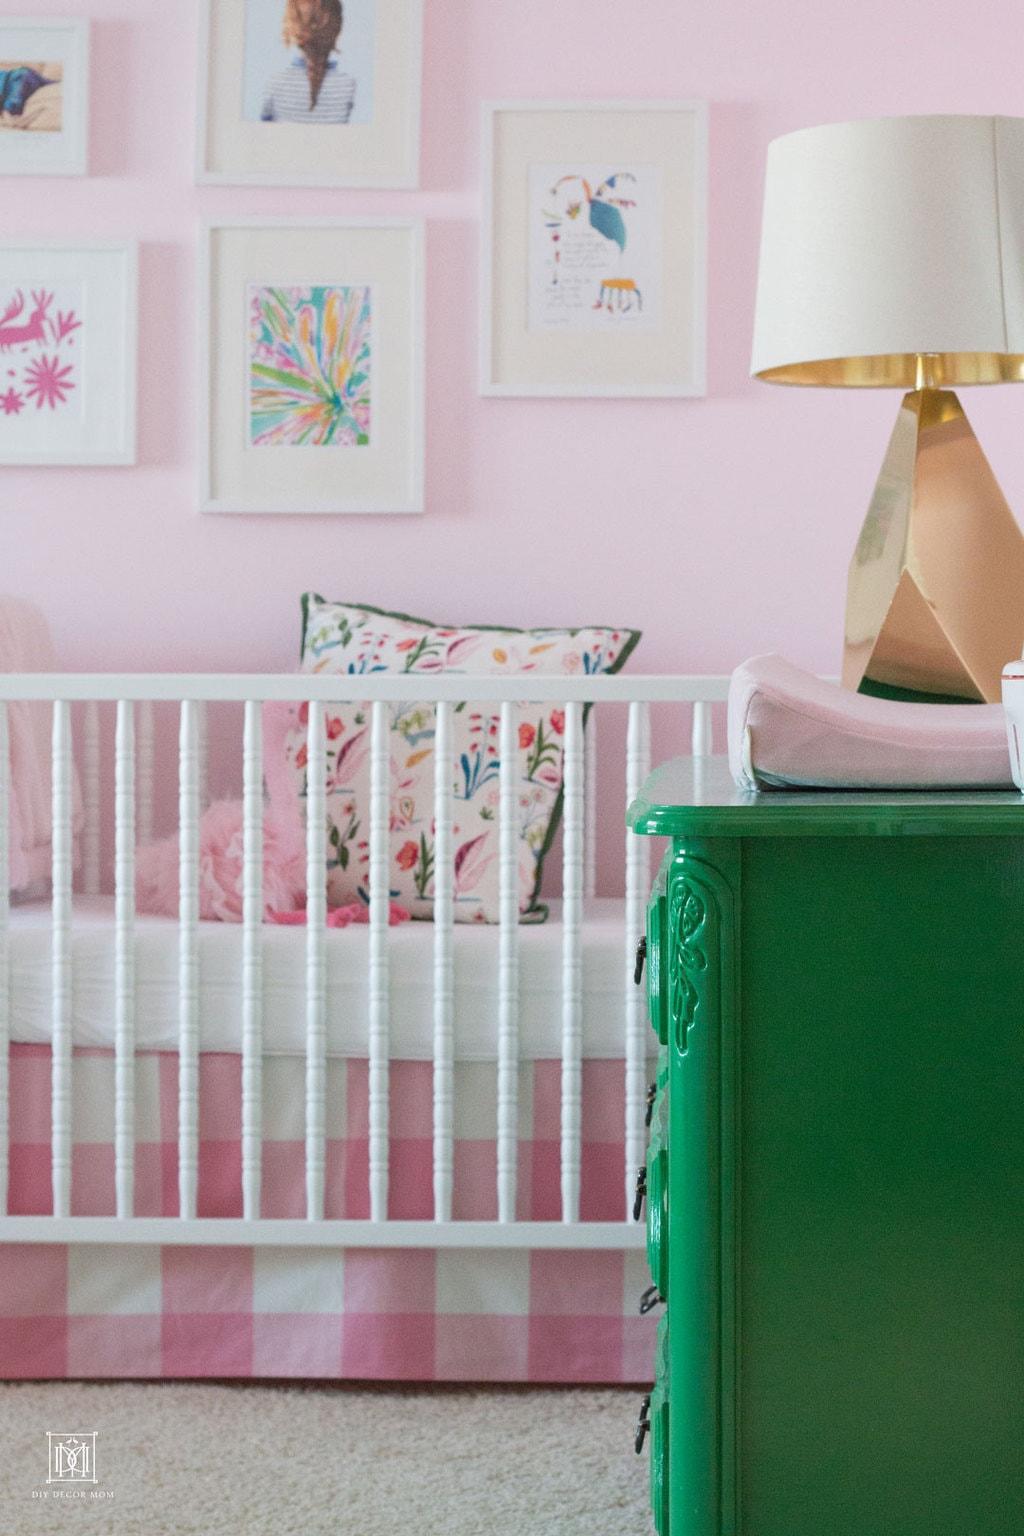 Crib Bed Skirt Make Your Own Diy Crib Skirt With This